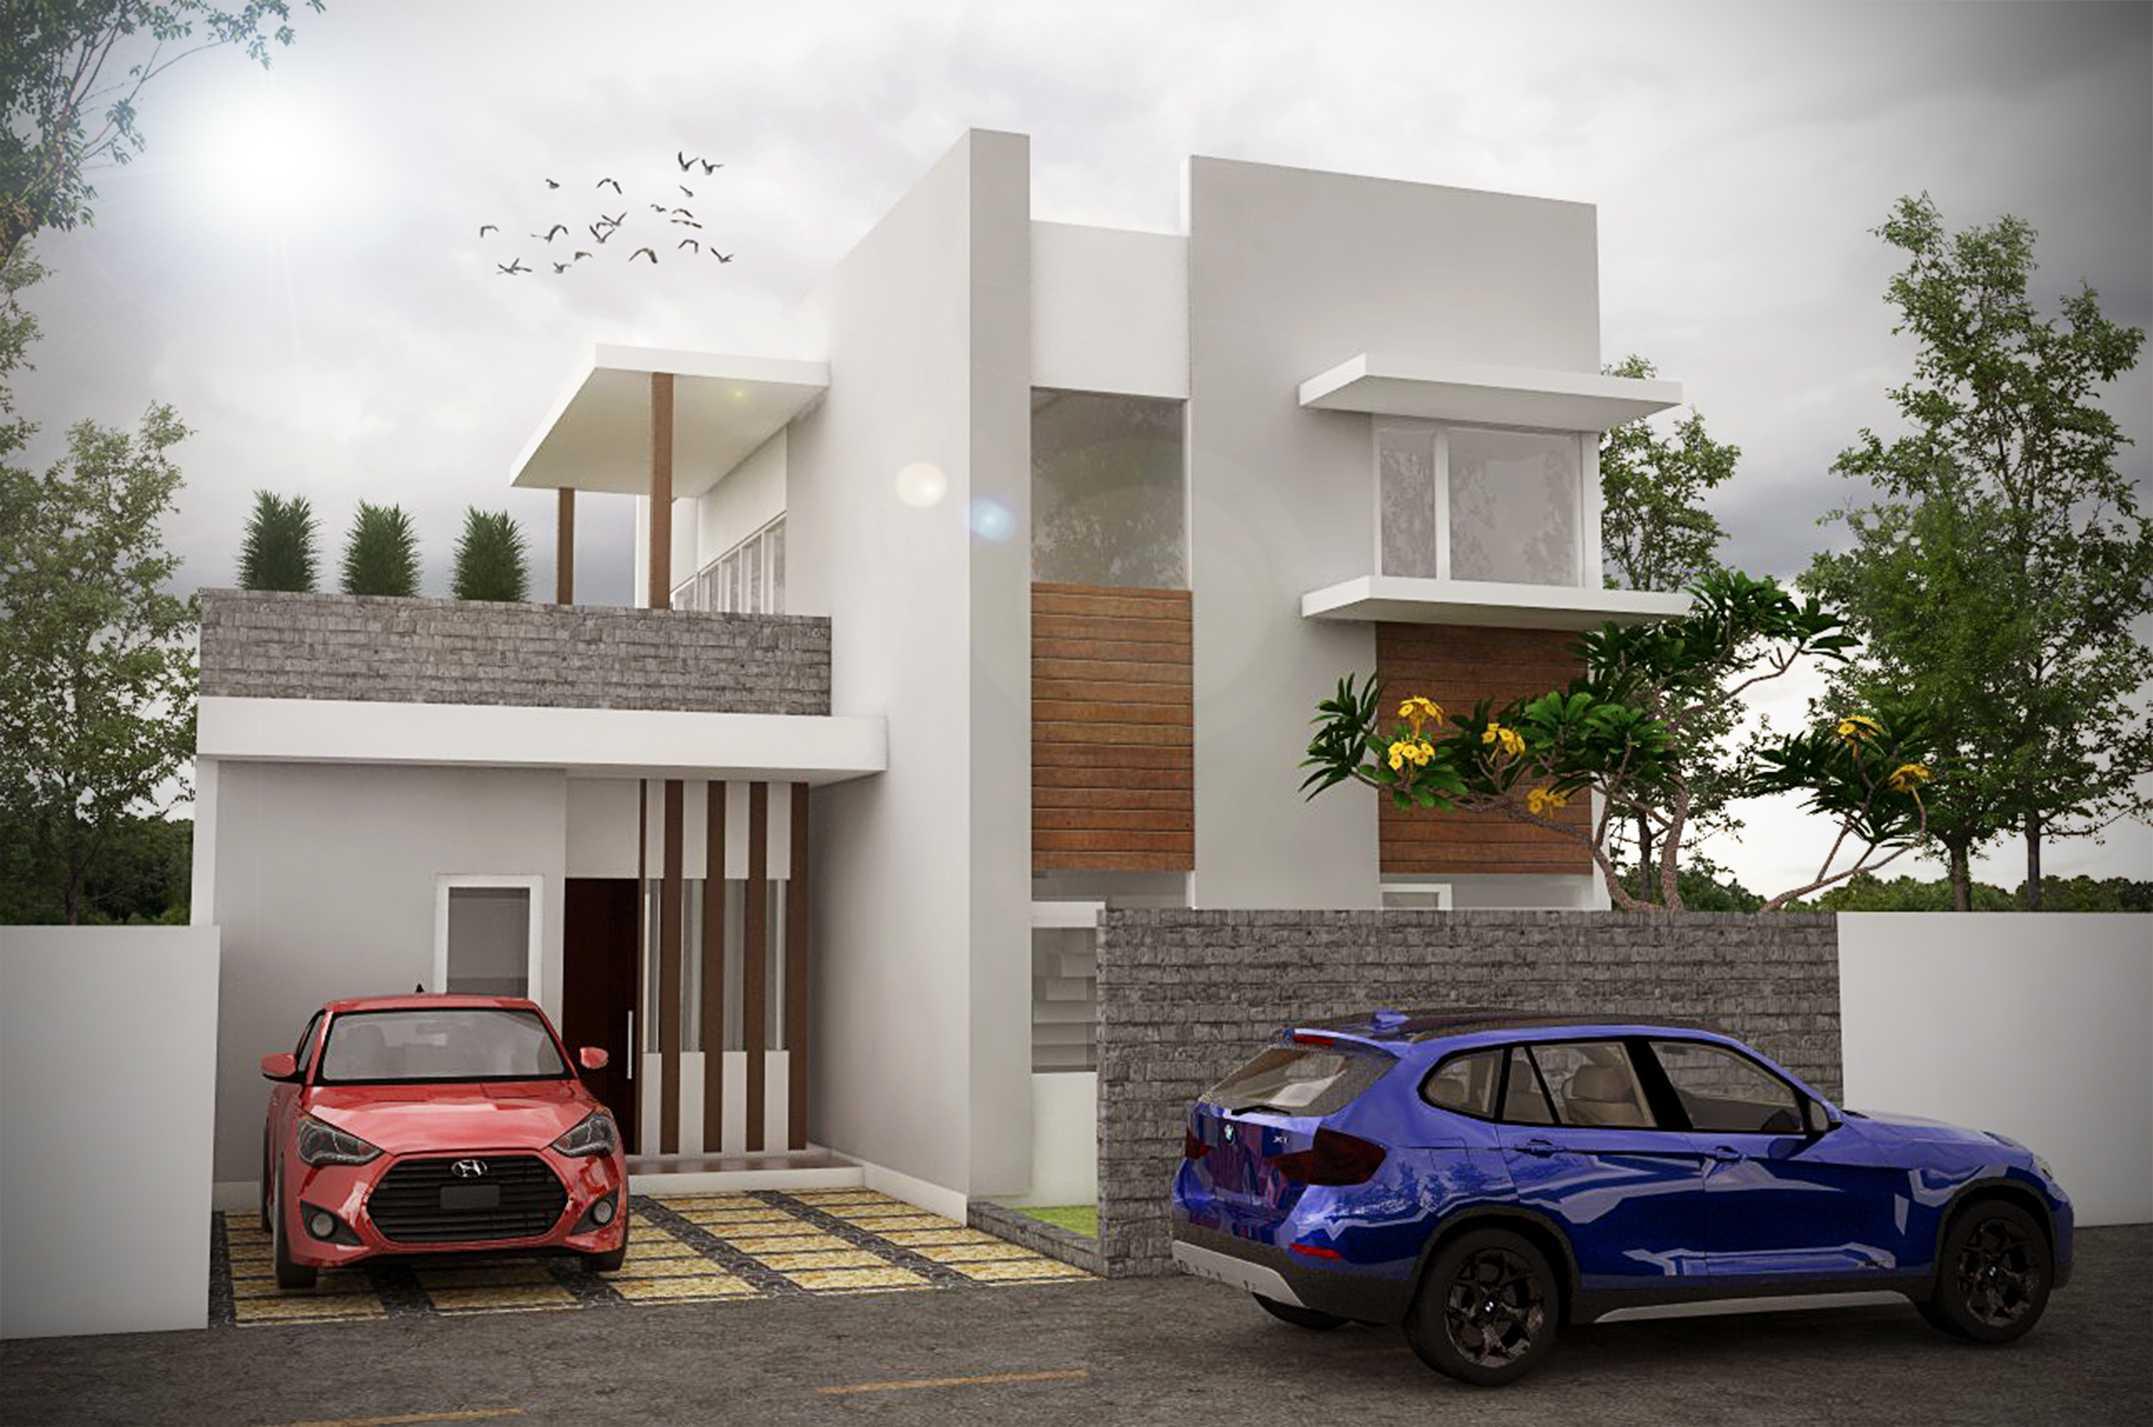 Sabio Design Bintaro Modern House - Tangerang Jalan Menteng Blok A13No.4Pondok Aren, Jurang Mangu Barat, East Jurang Manggu, Pondok Aren, South Tangerang City, Banten 15223, Indonesia Jalan Menteng Blok A13No.4Pondok Aren, Jurang Mangu Barat, East Jurang Manggu, Pondok Aren, South Tangerang City, Banten 15223, Indonesia Sabio-Design-Bintaro-Modern-House-Tangerang  116094